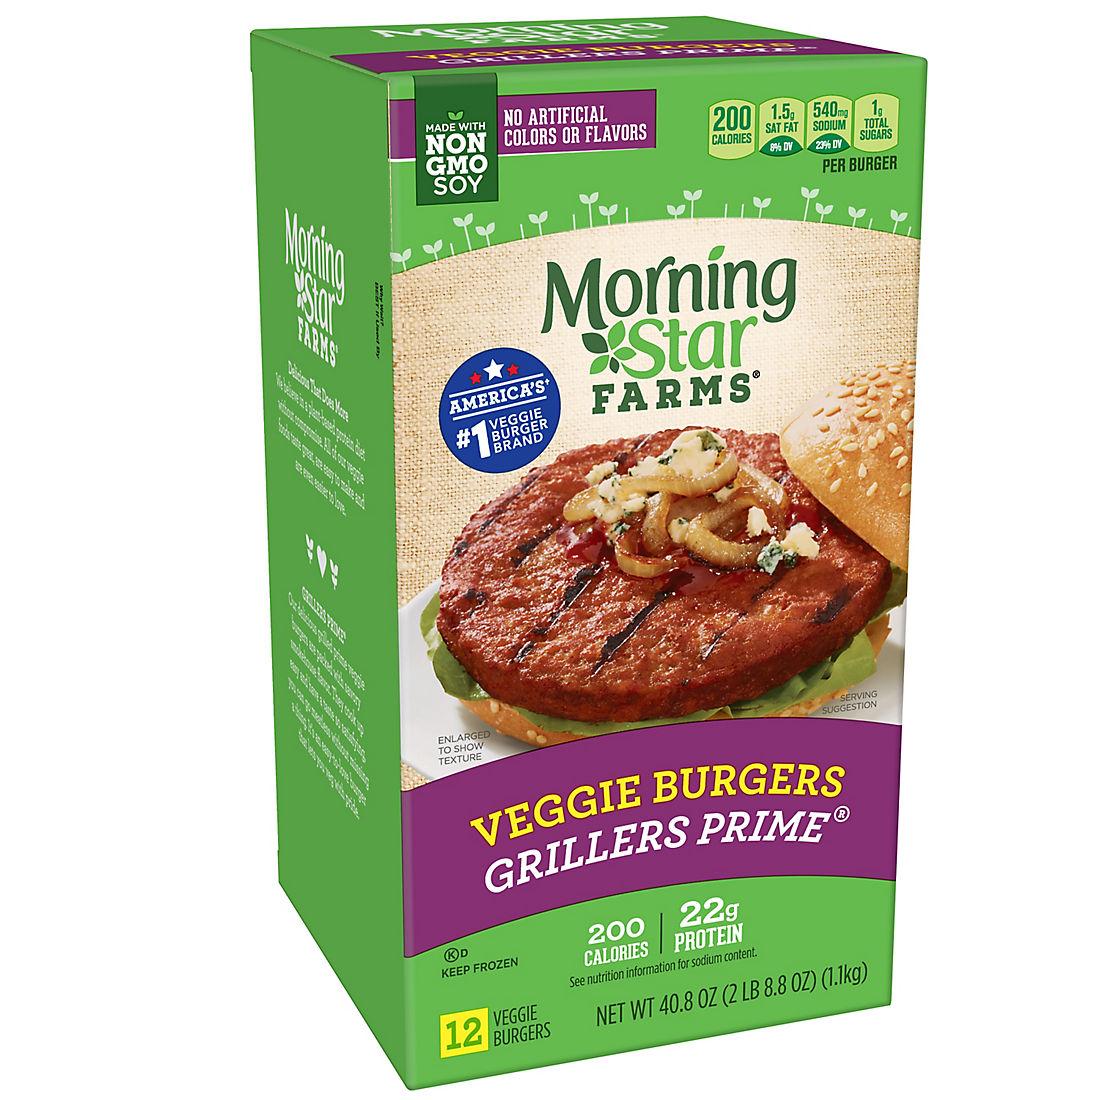 Morningstar Farms Grillers Prime Veggie Burgers 12 Ct